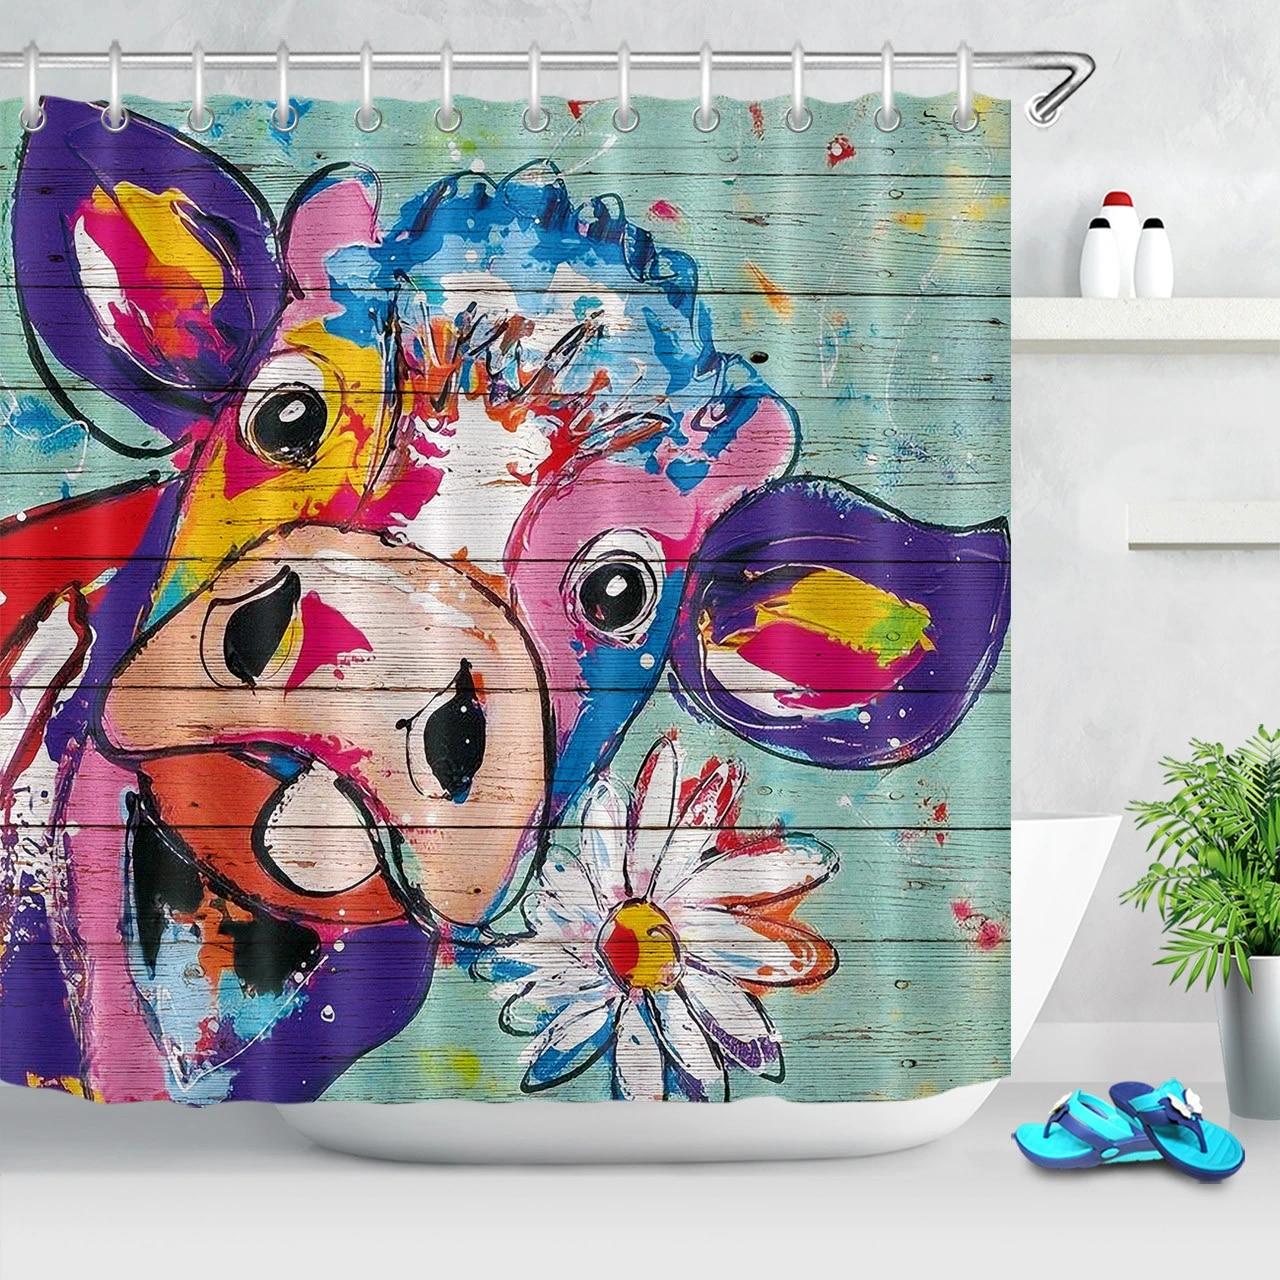 graffiti design flower cow shower curtain rustic wooden plank bathroom curtains polyester fabric bath curtains home decor